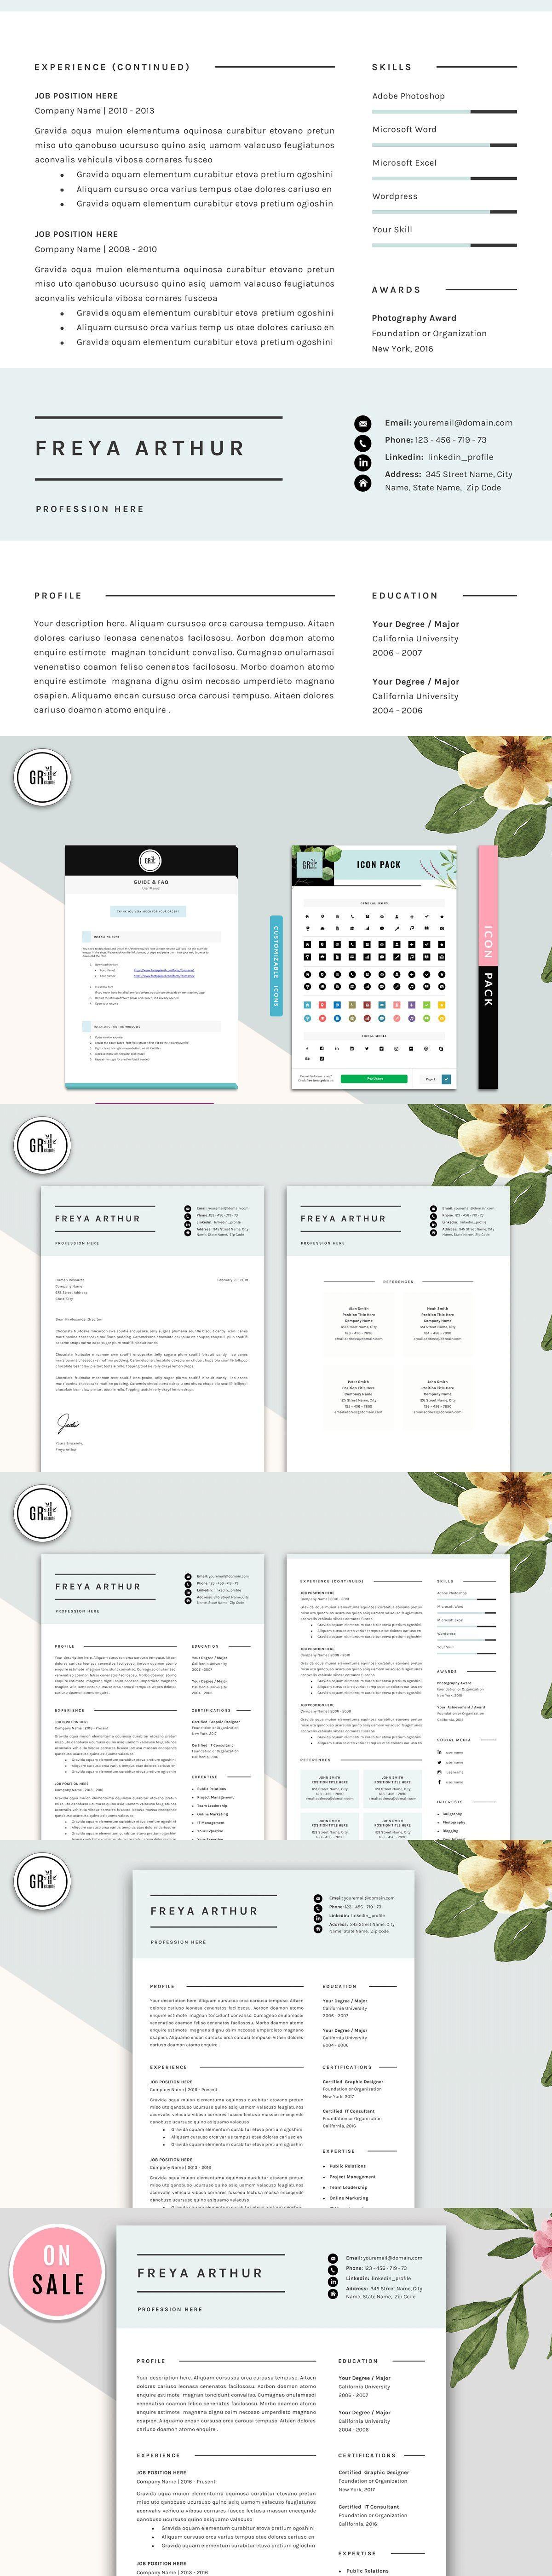 Professional CV Resume Templates Resume template word